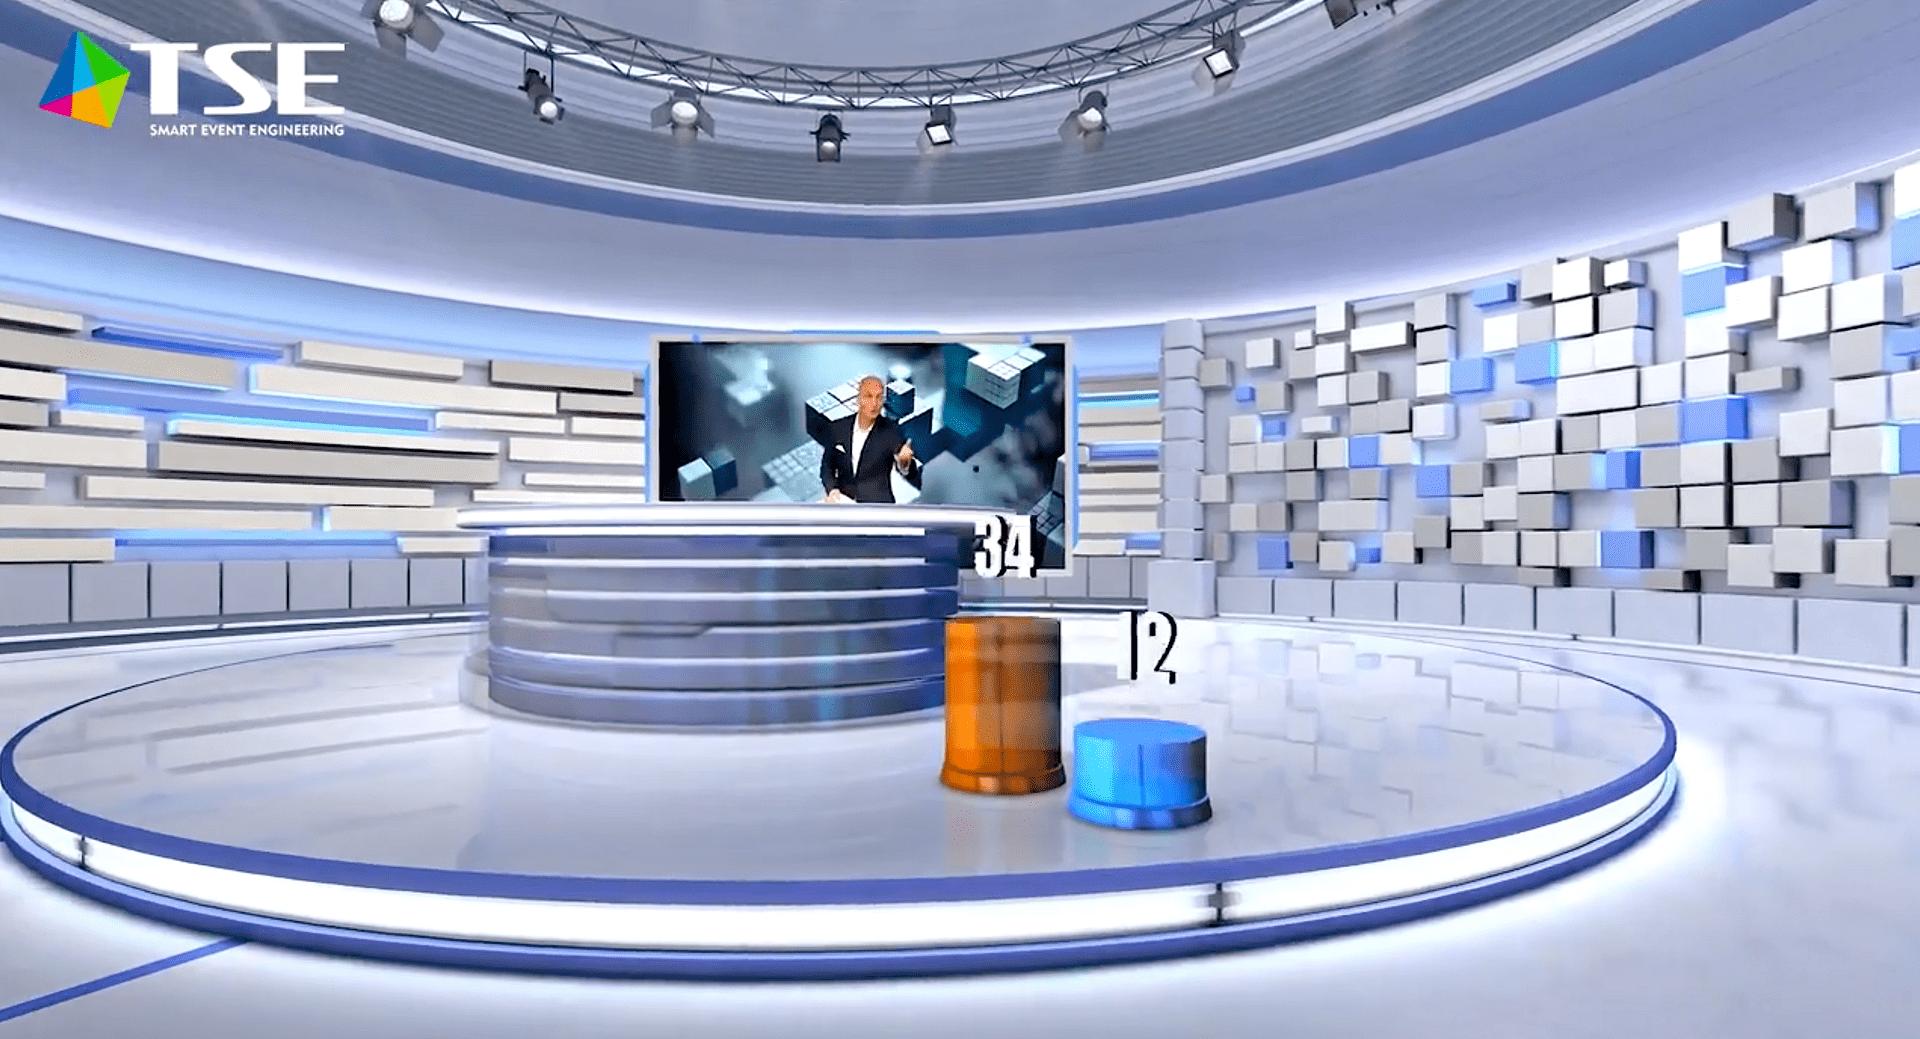 ZZZrzut ekranu 2020-10-13 o 13.00.15